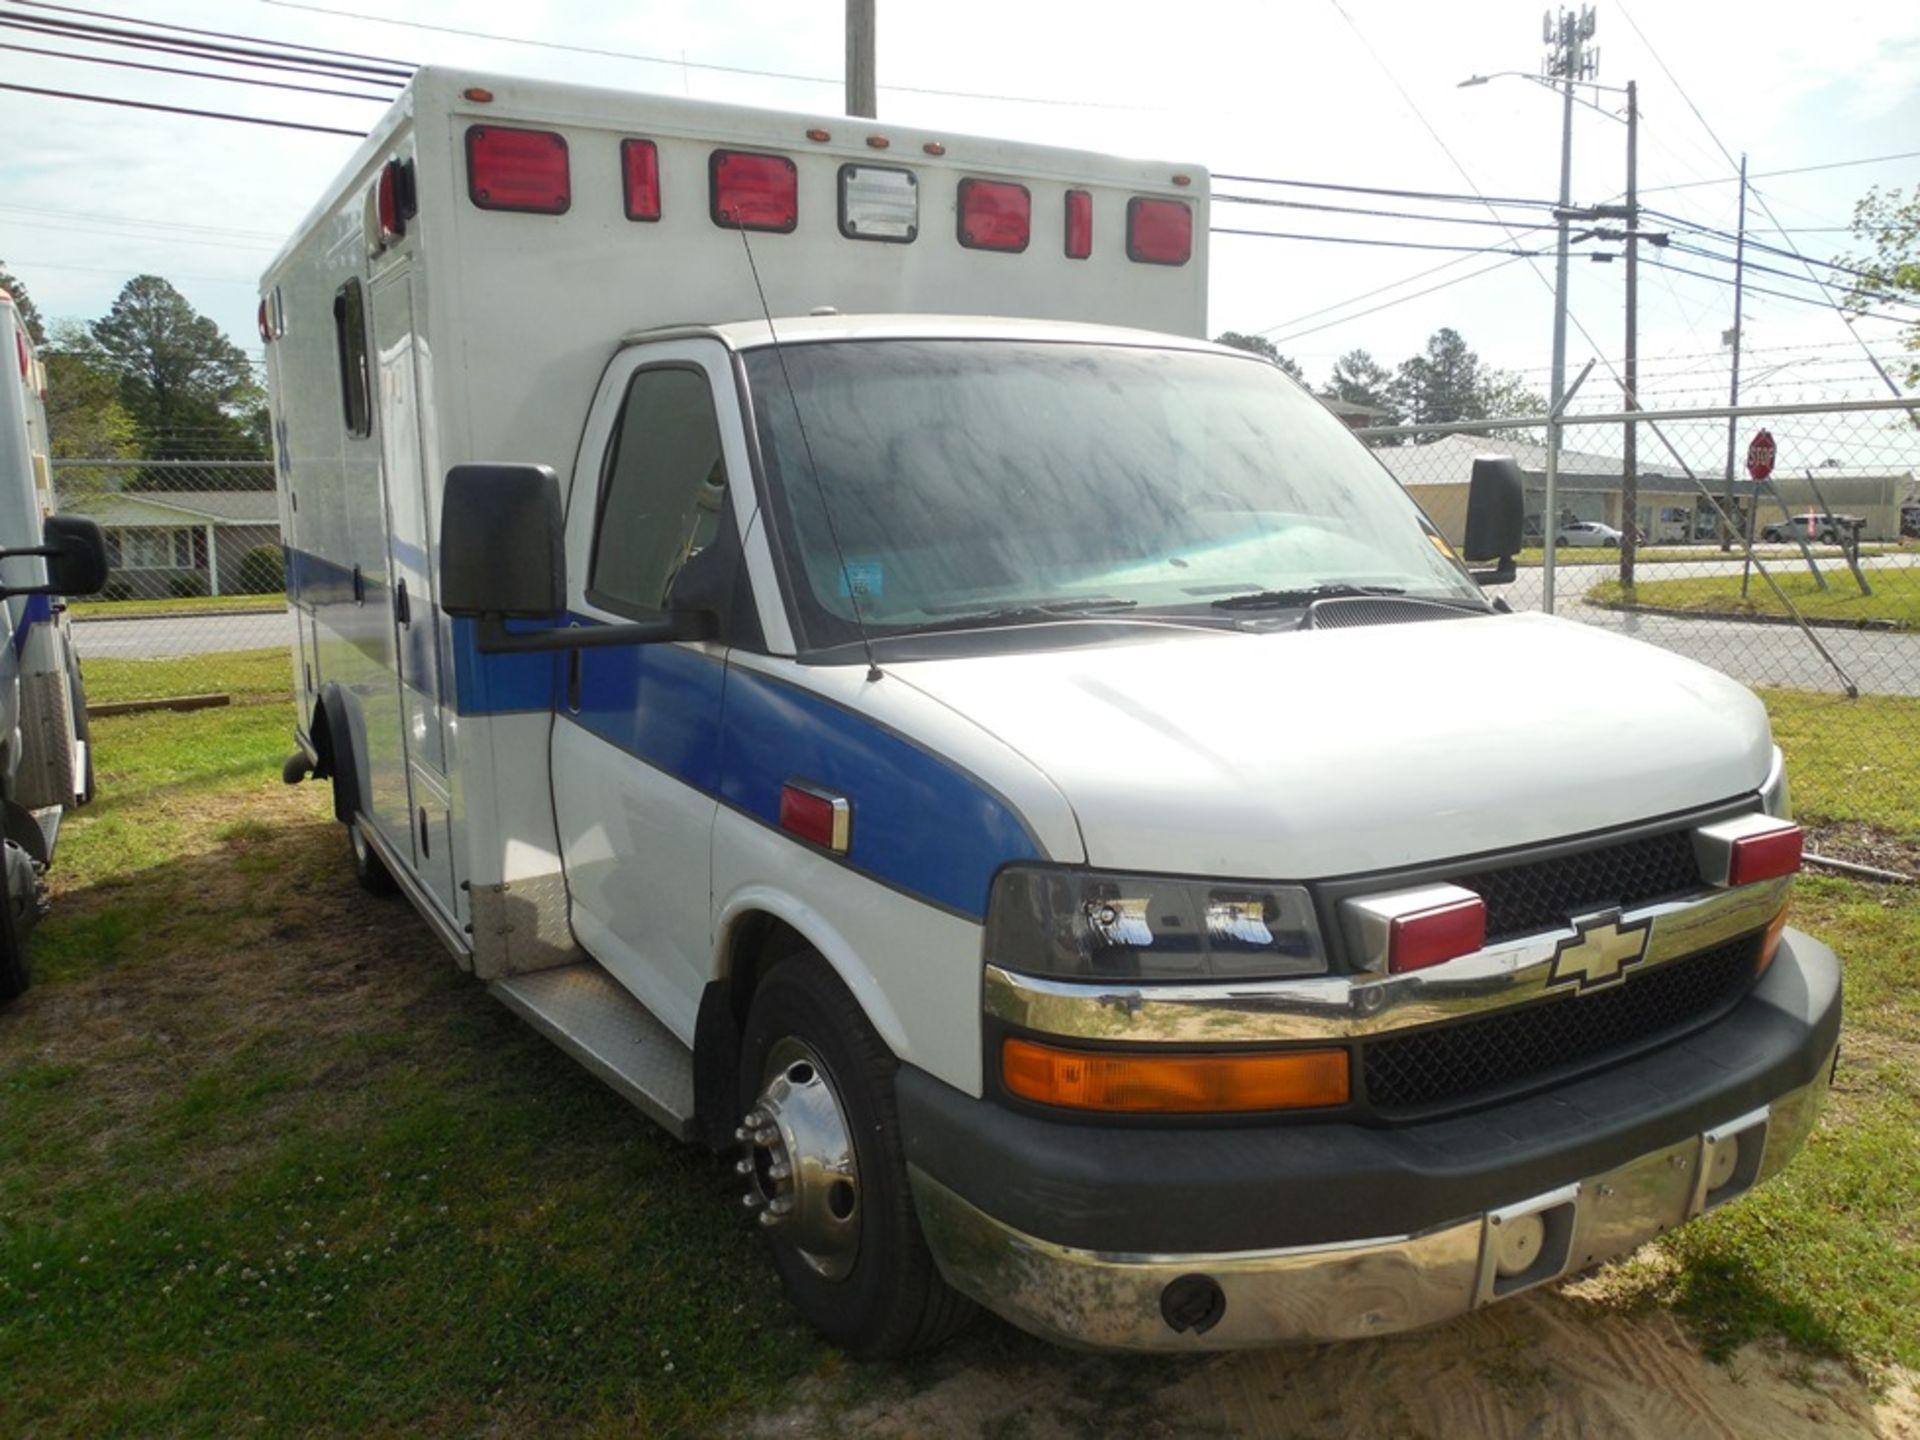 2010 Chev box van ambulance dsl, 250,597 miles, vin# 1GB9G5B65A1116120 - Image 3 of 6